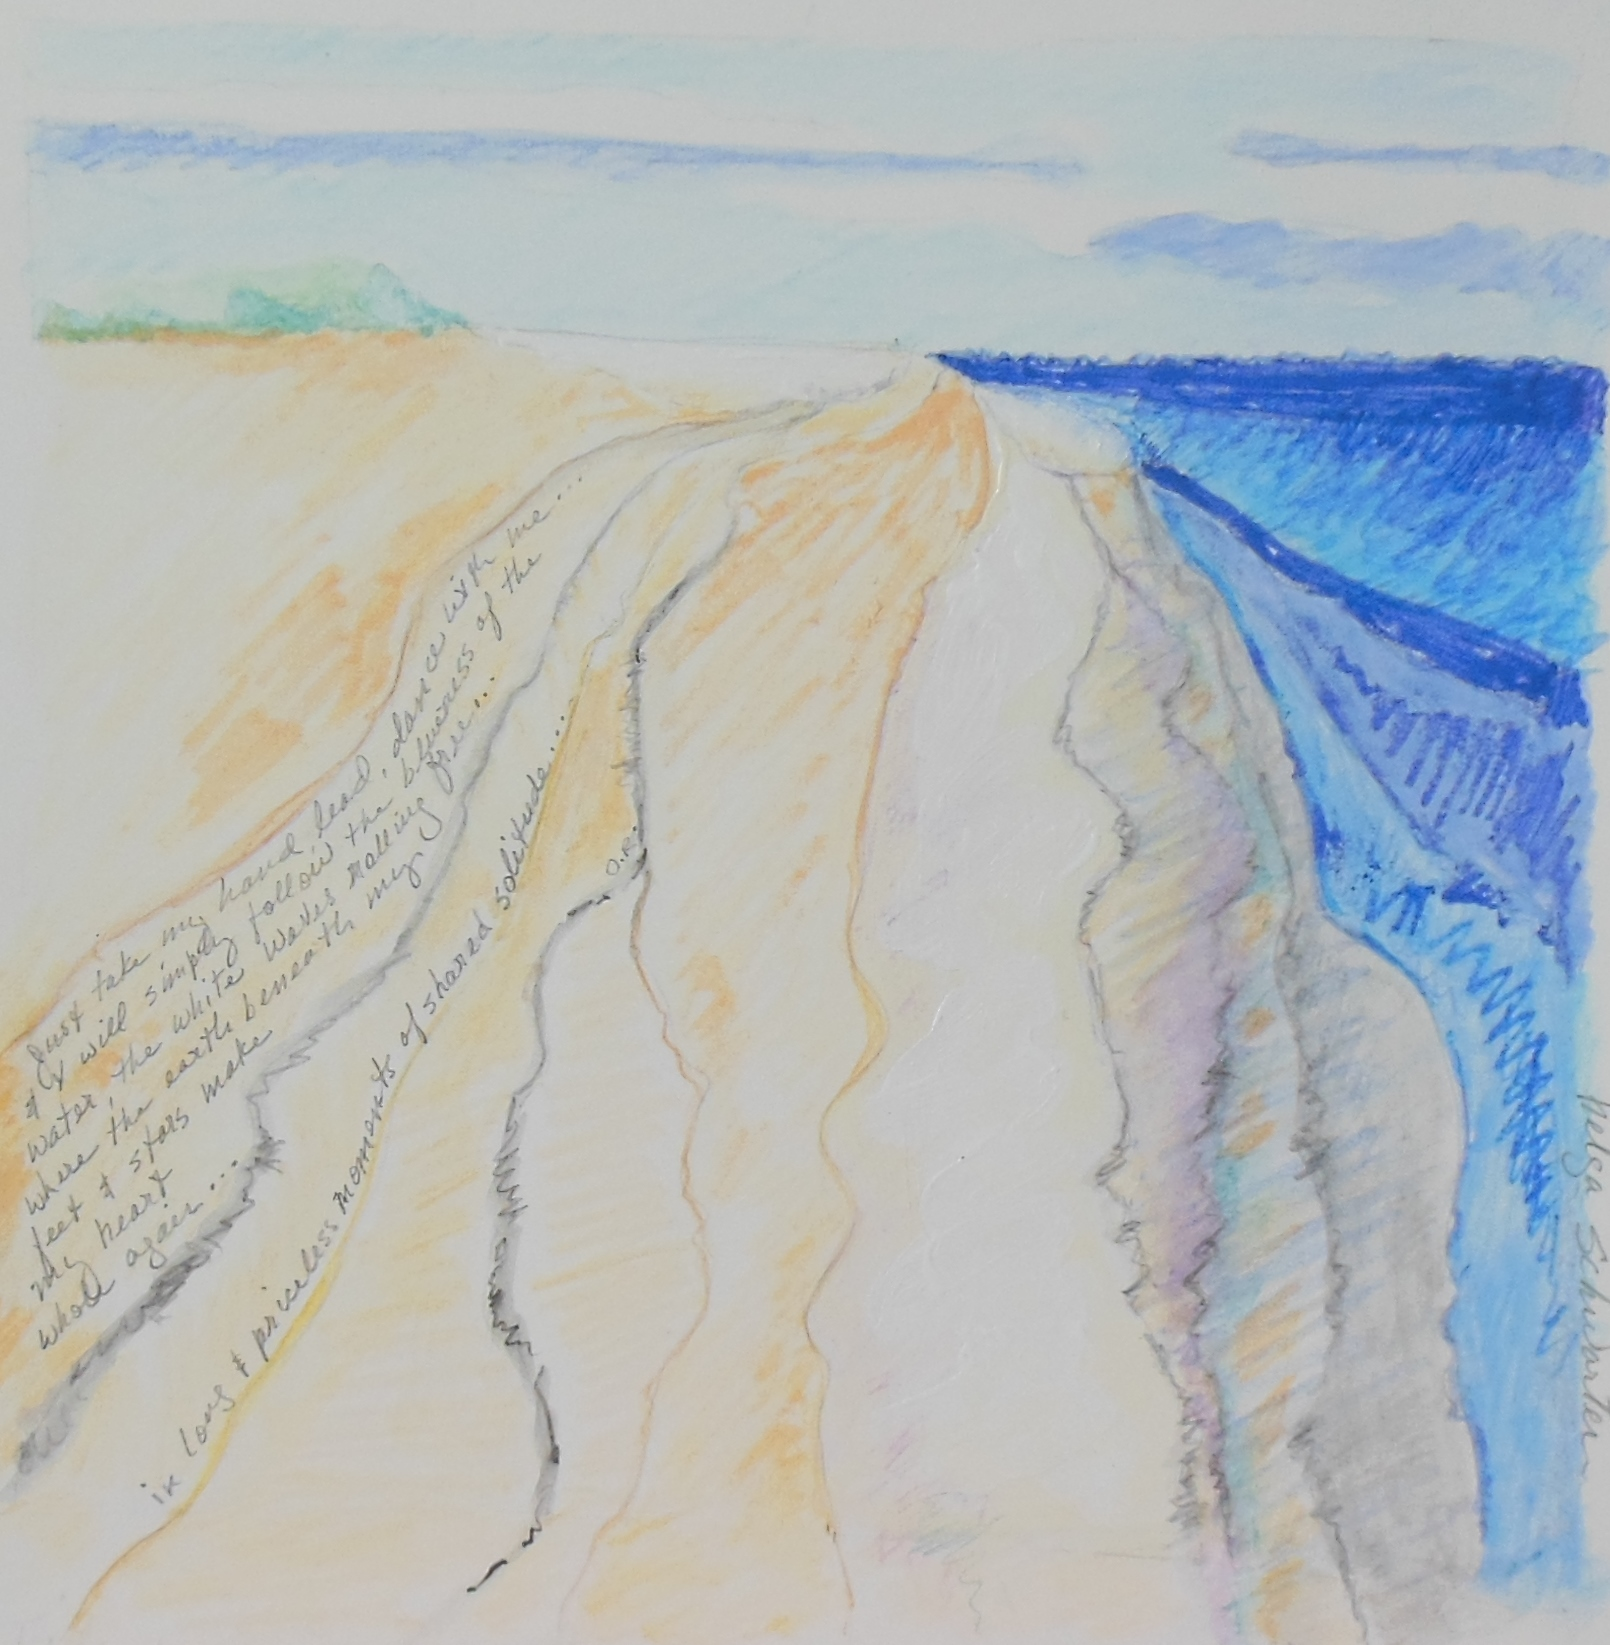 Seabrook Beach - Shared Solitude